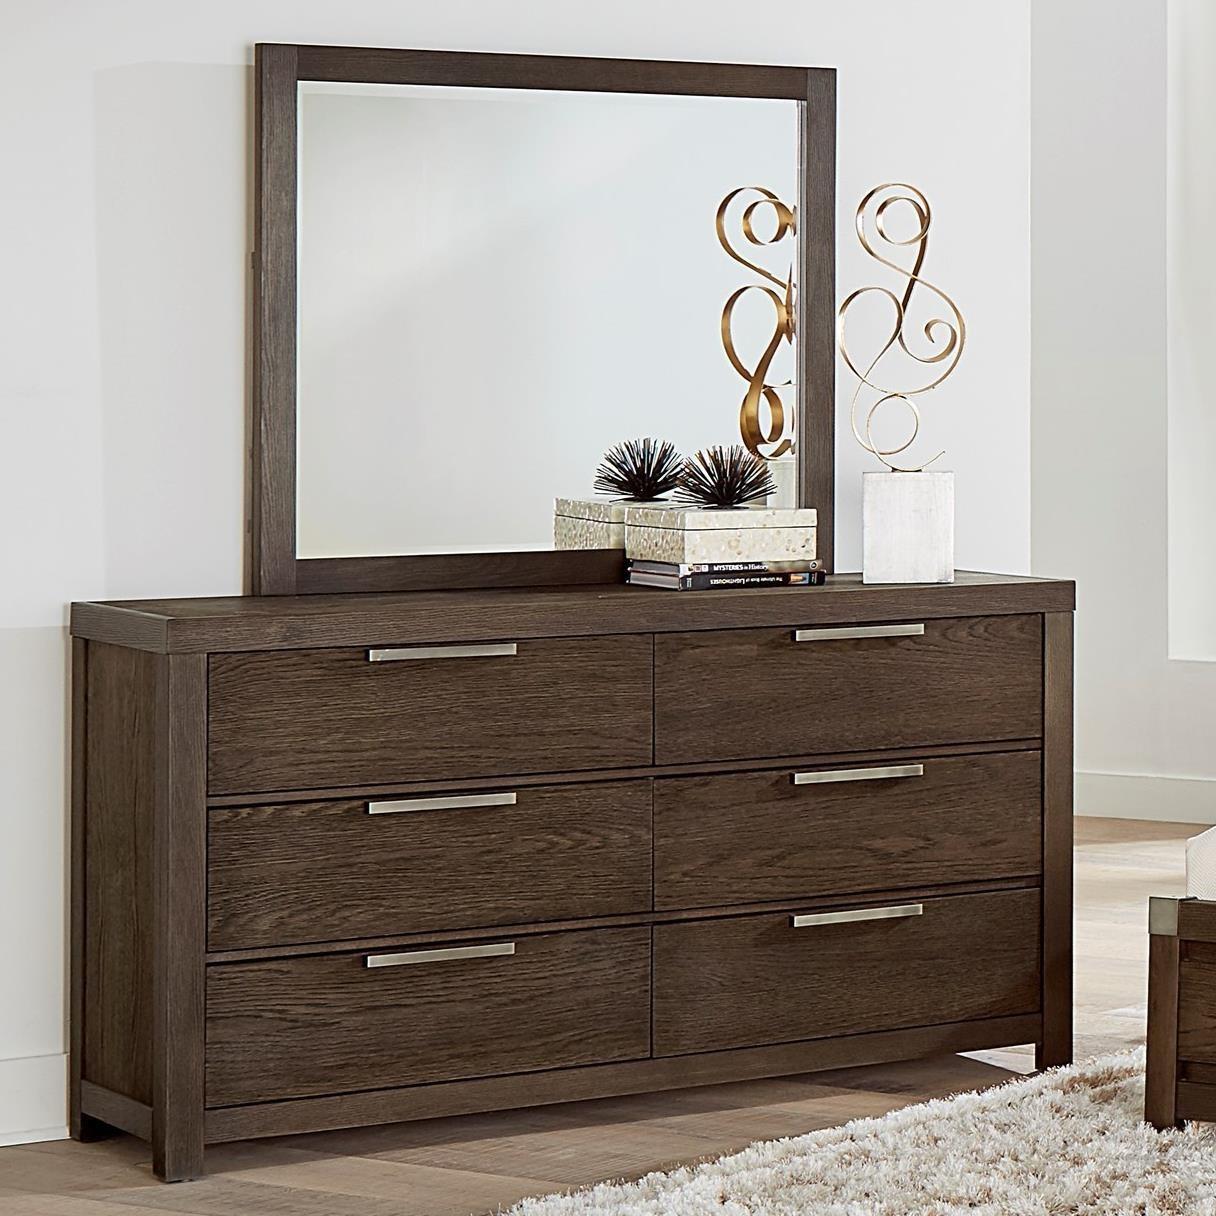 Vaughan Bassett American Modern Dresser & Landscape Mirror - Item Number: 650-002+446